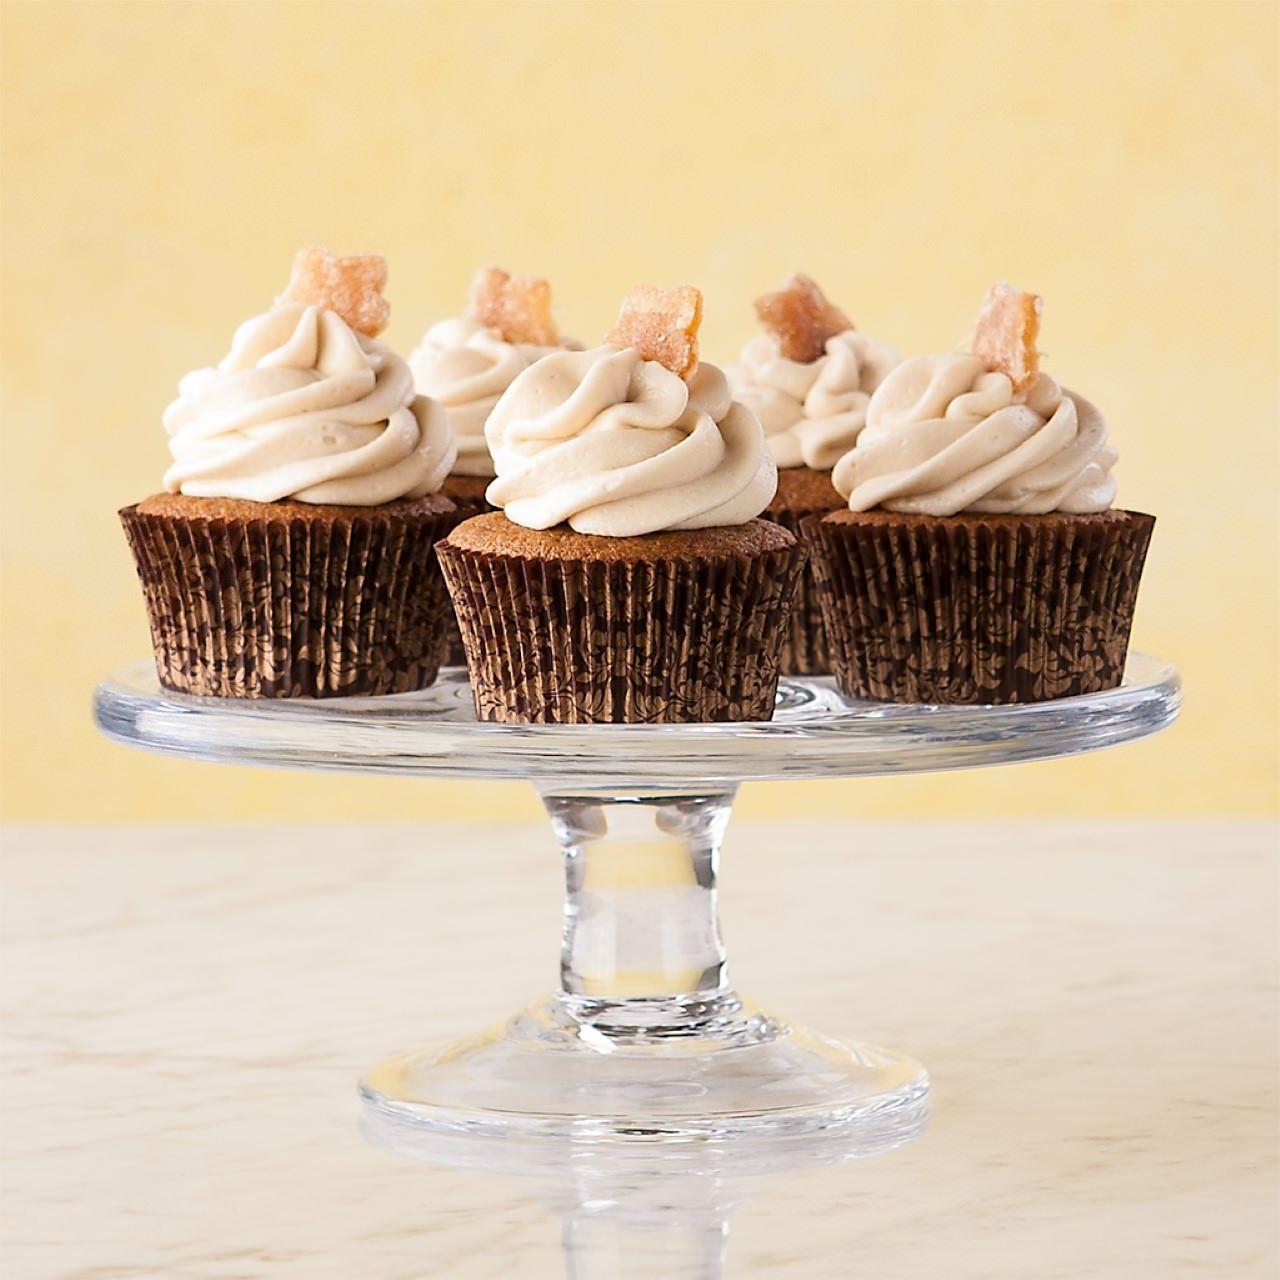 Ginger cupcakes recipe gluten free cupcakes gluten